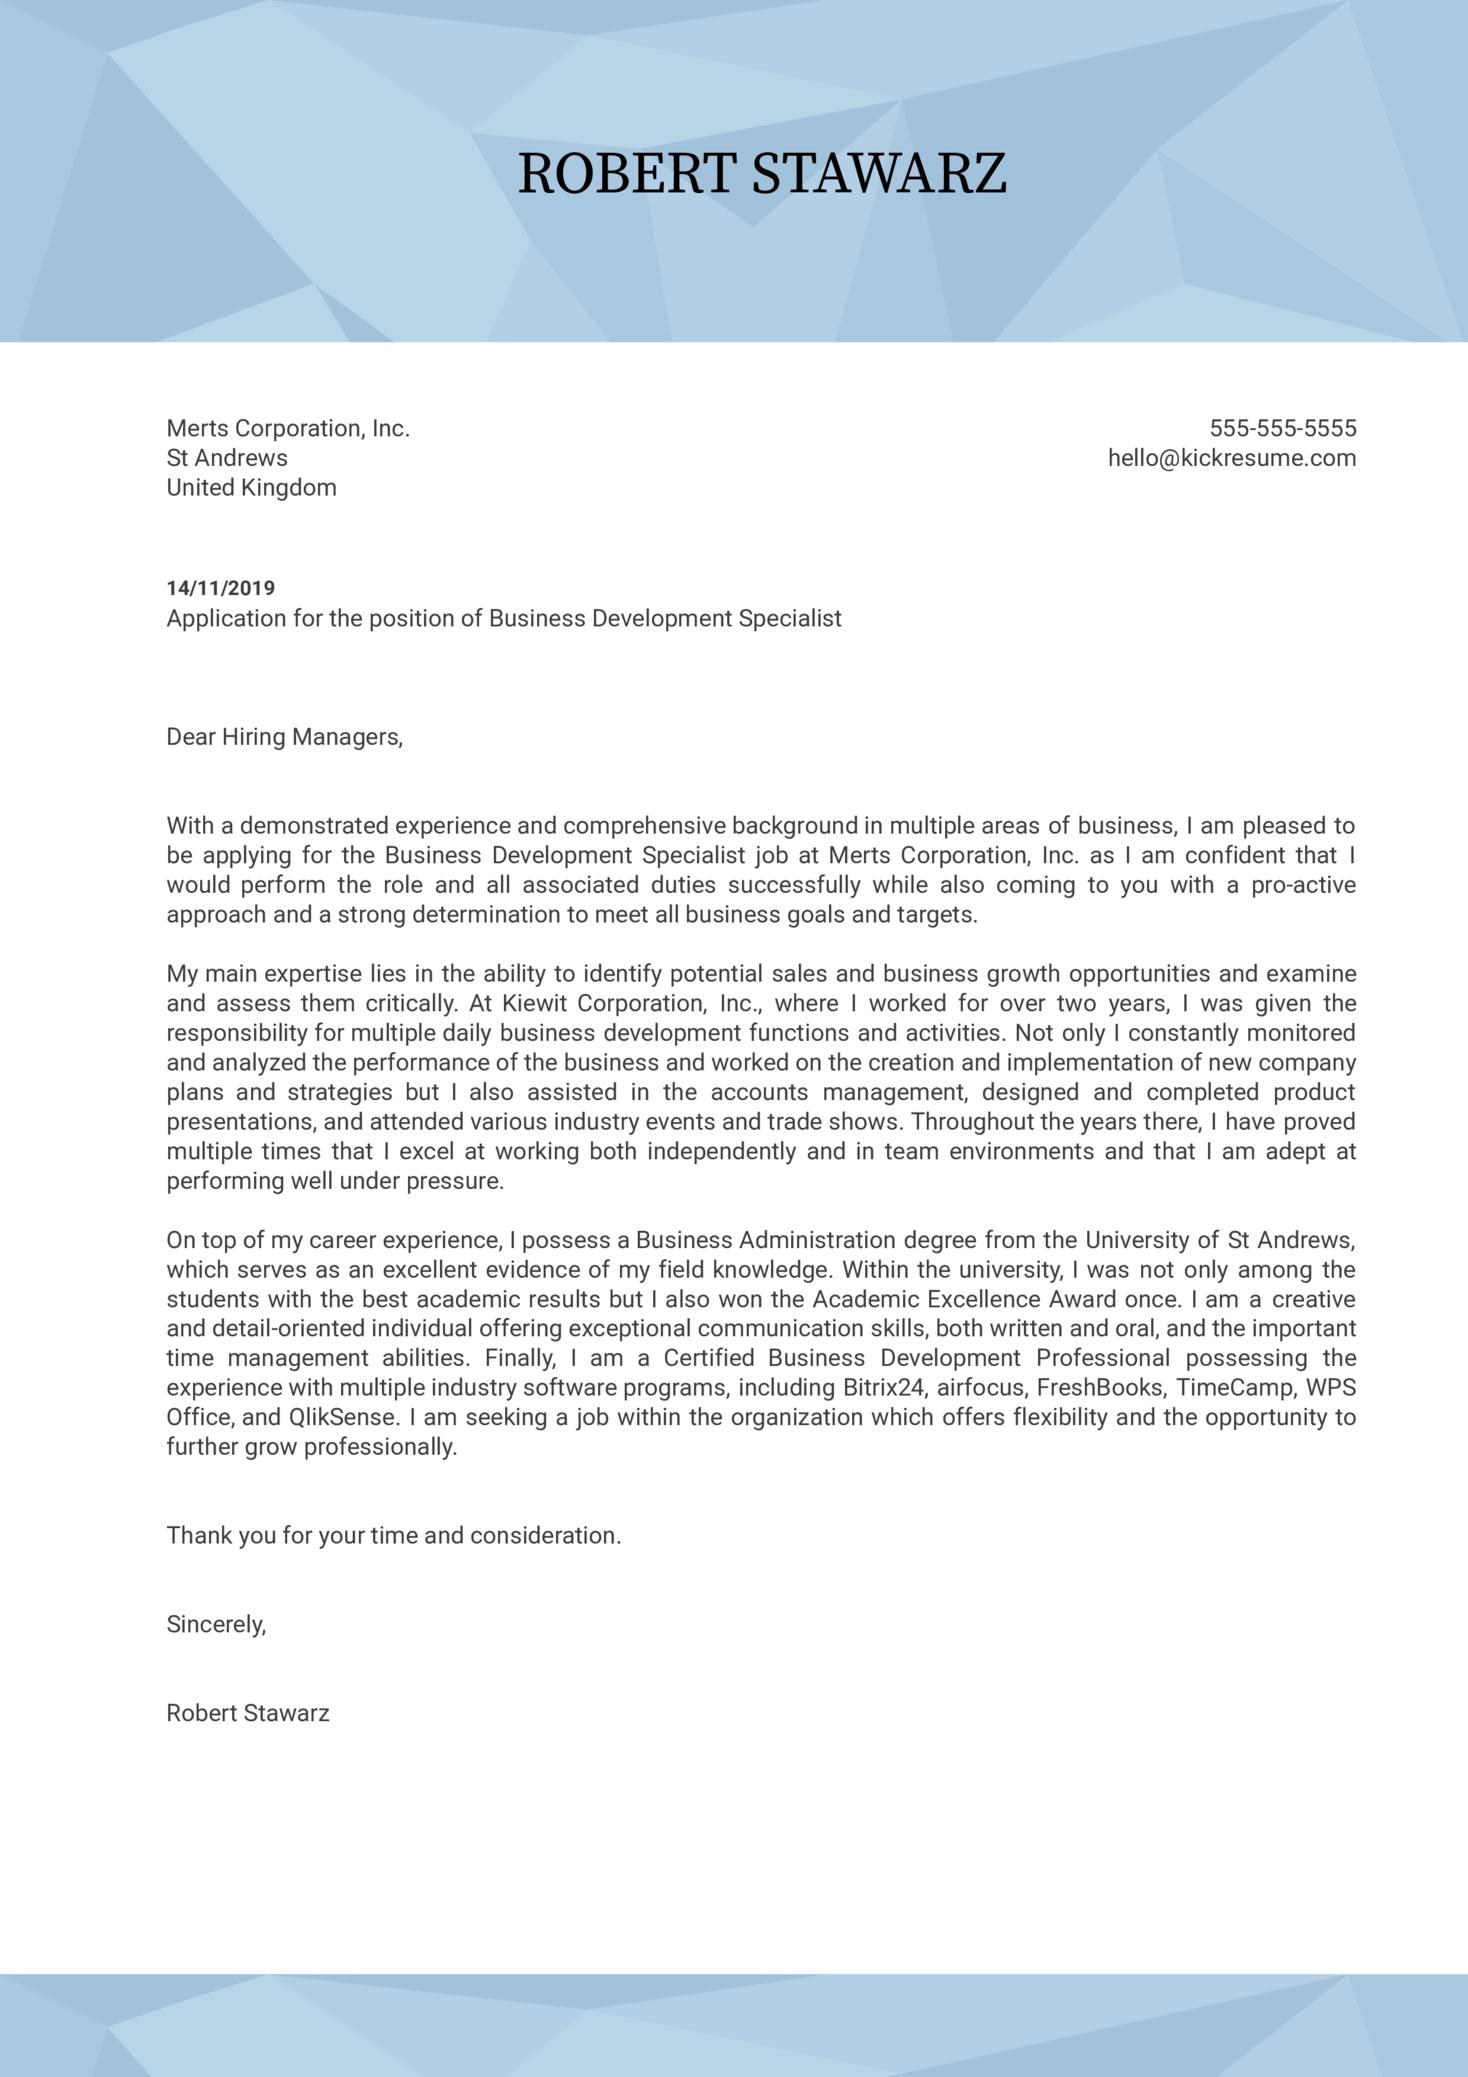 Business Development Specialist Cover Letter Sample